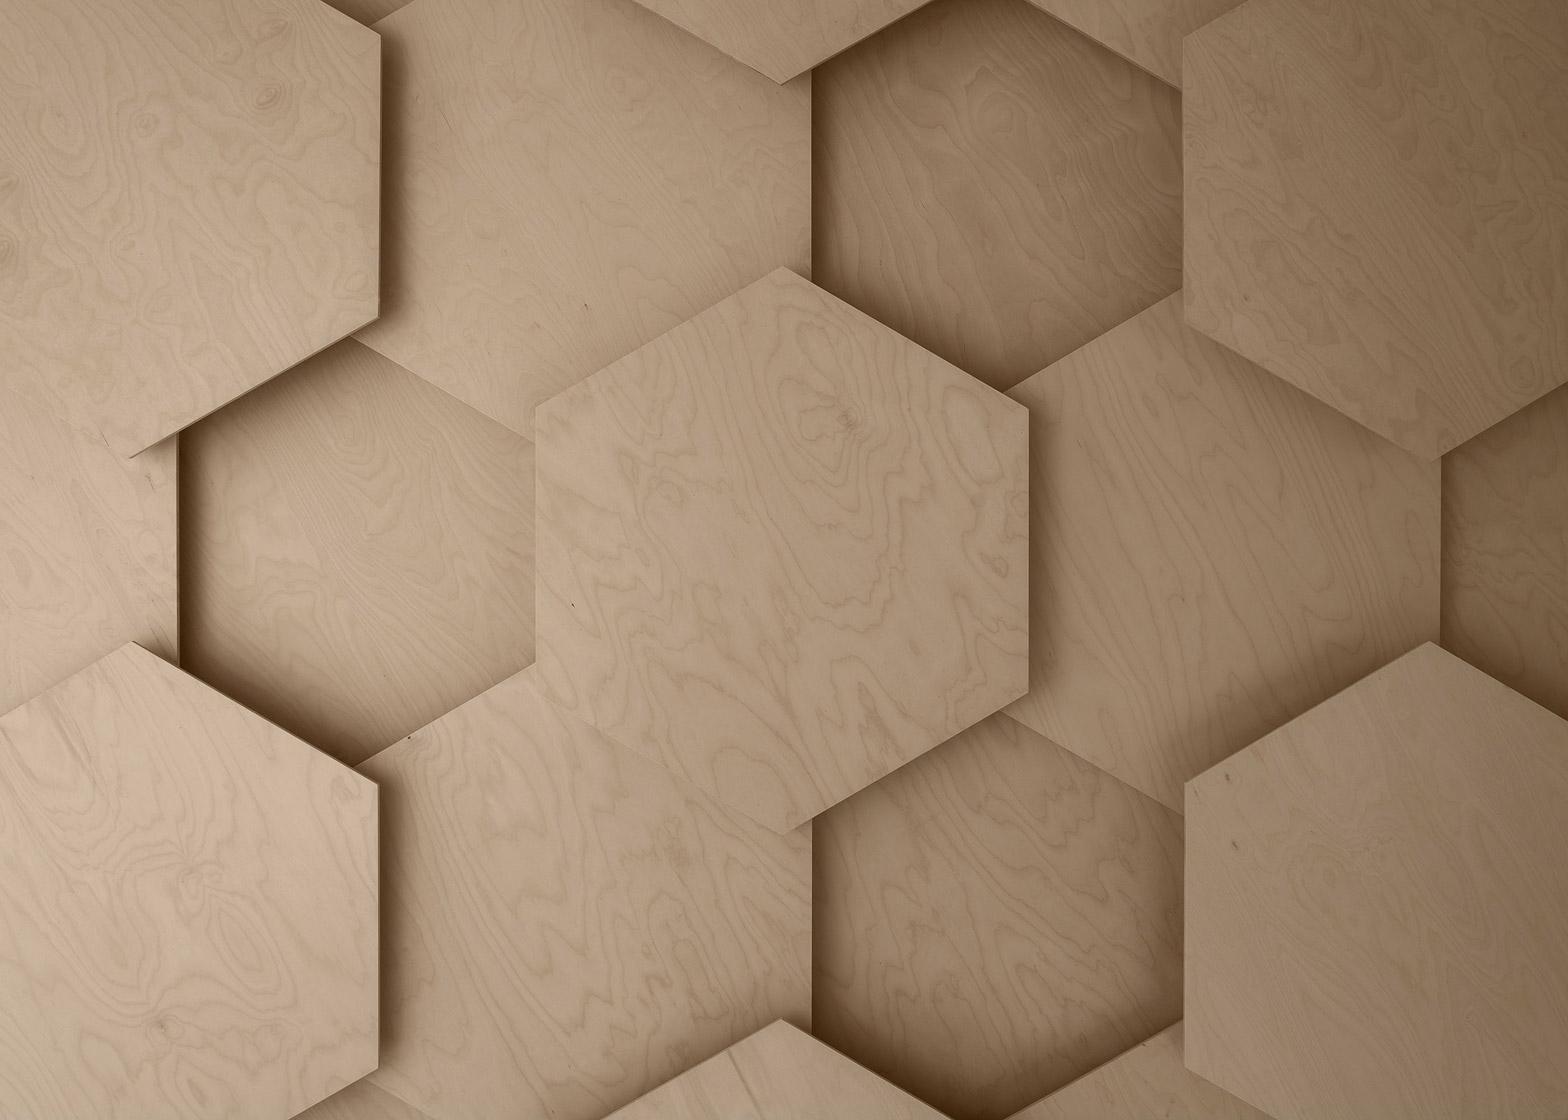 architecture_barber_shop_design_studia_interiors_osnovadesign_osnova_poltava_04